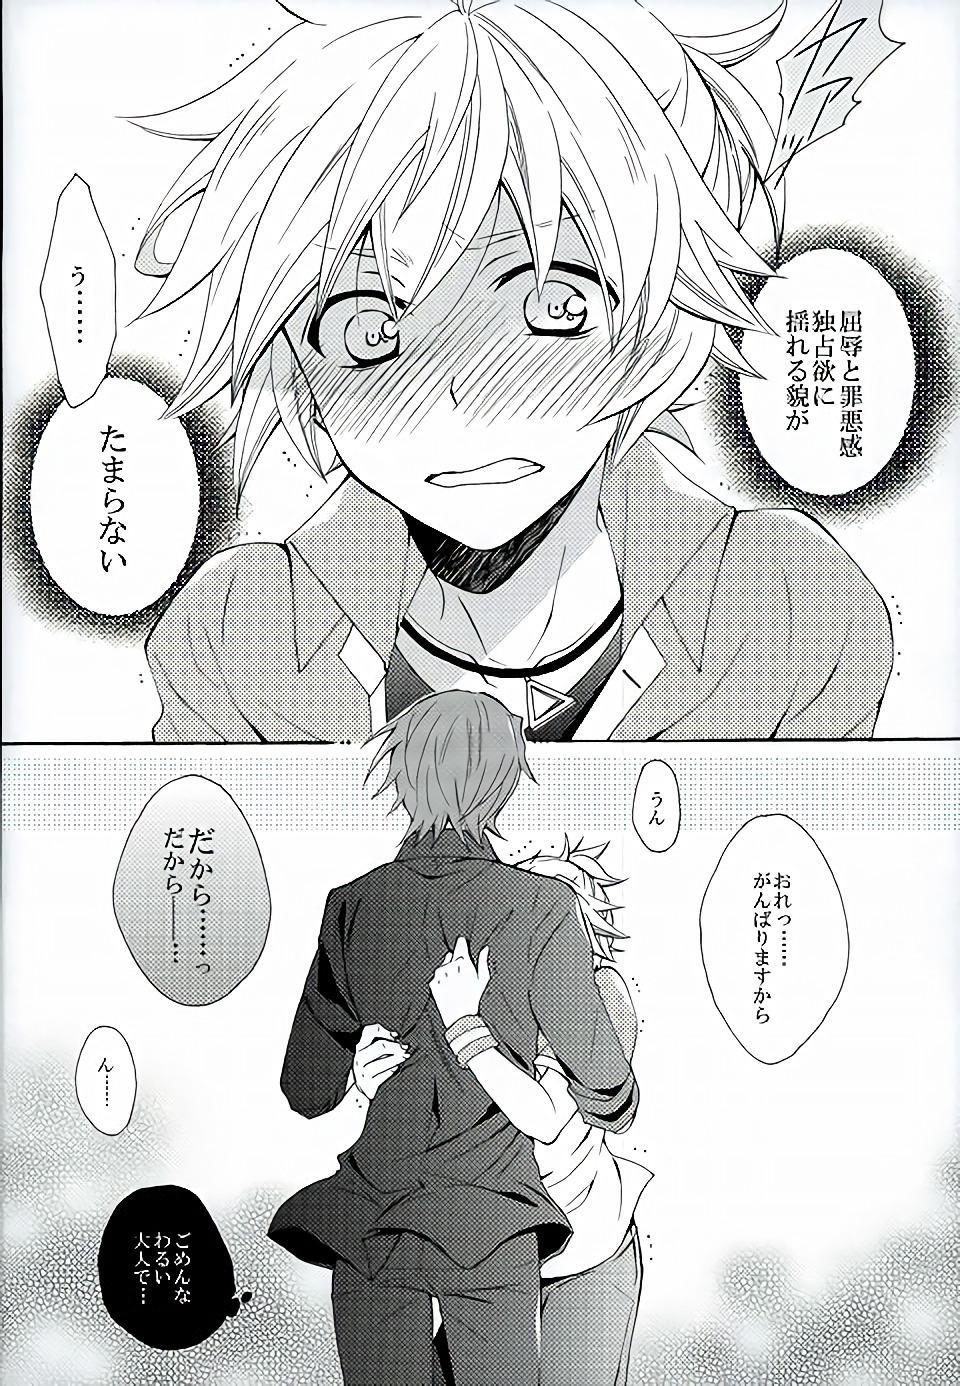 Hatsudori Document 18